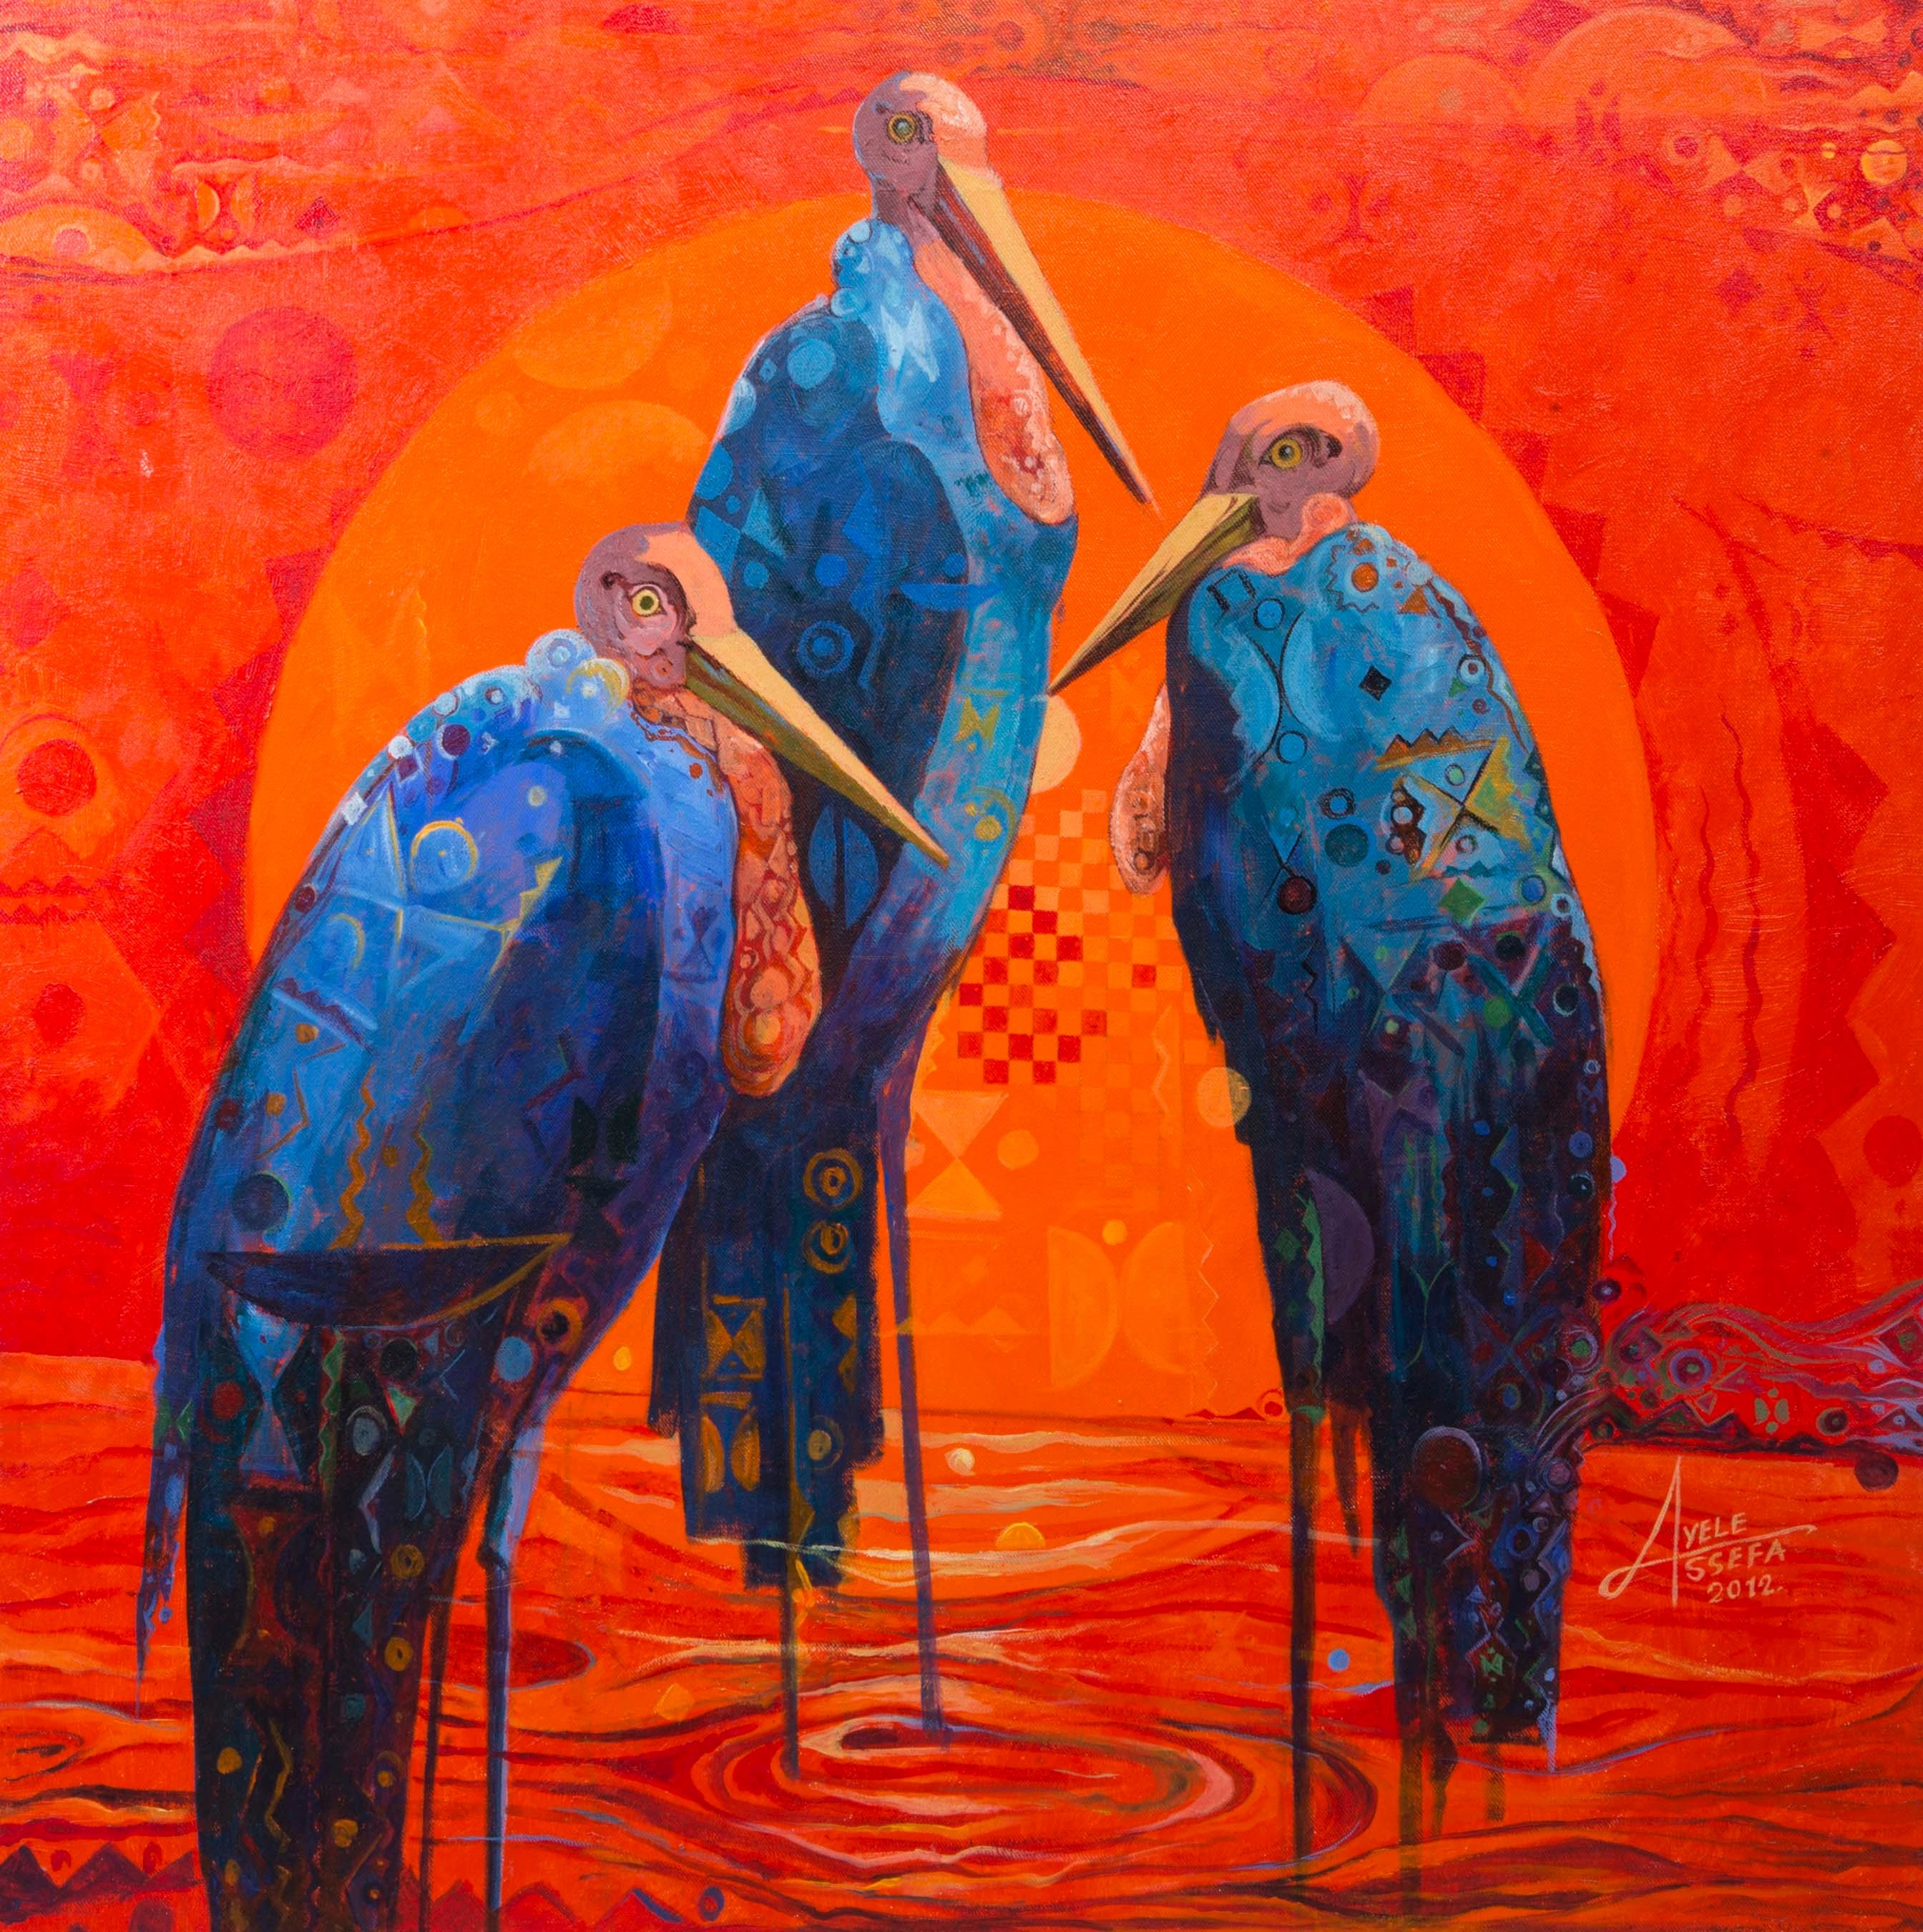 Free 15 Modern Art Paintings In Psd